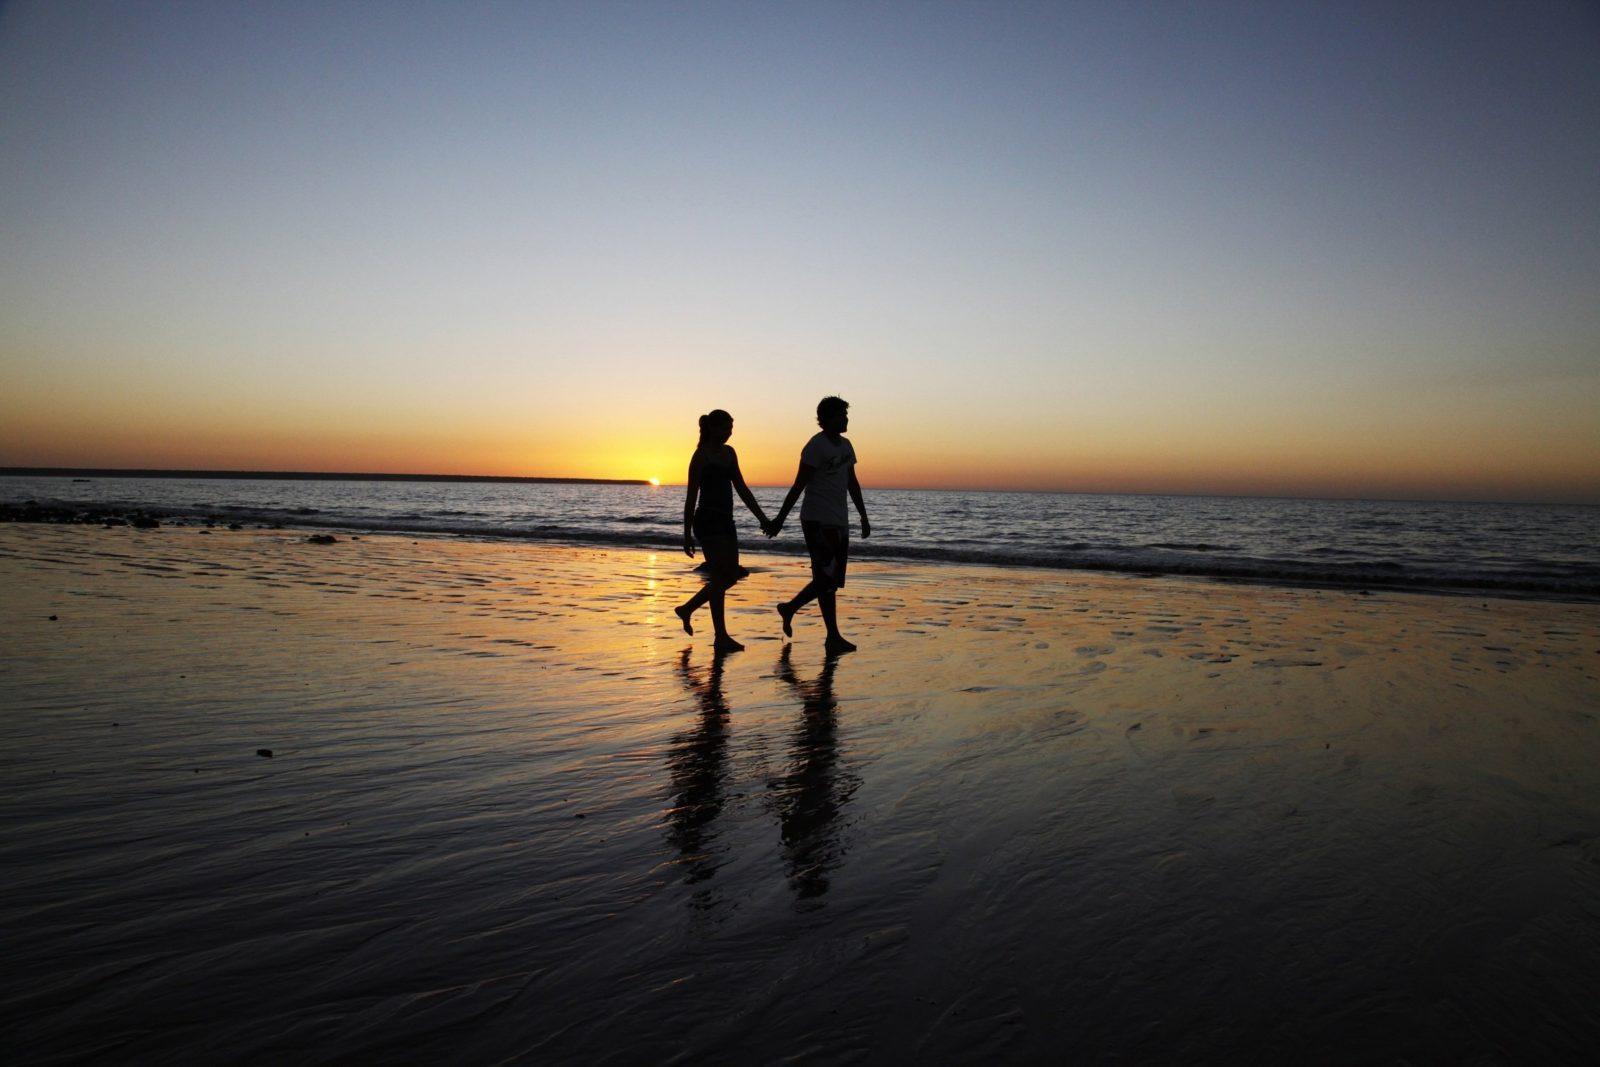 Dampier Peninsula, Western Australia